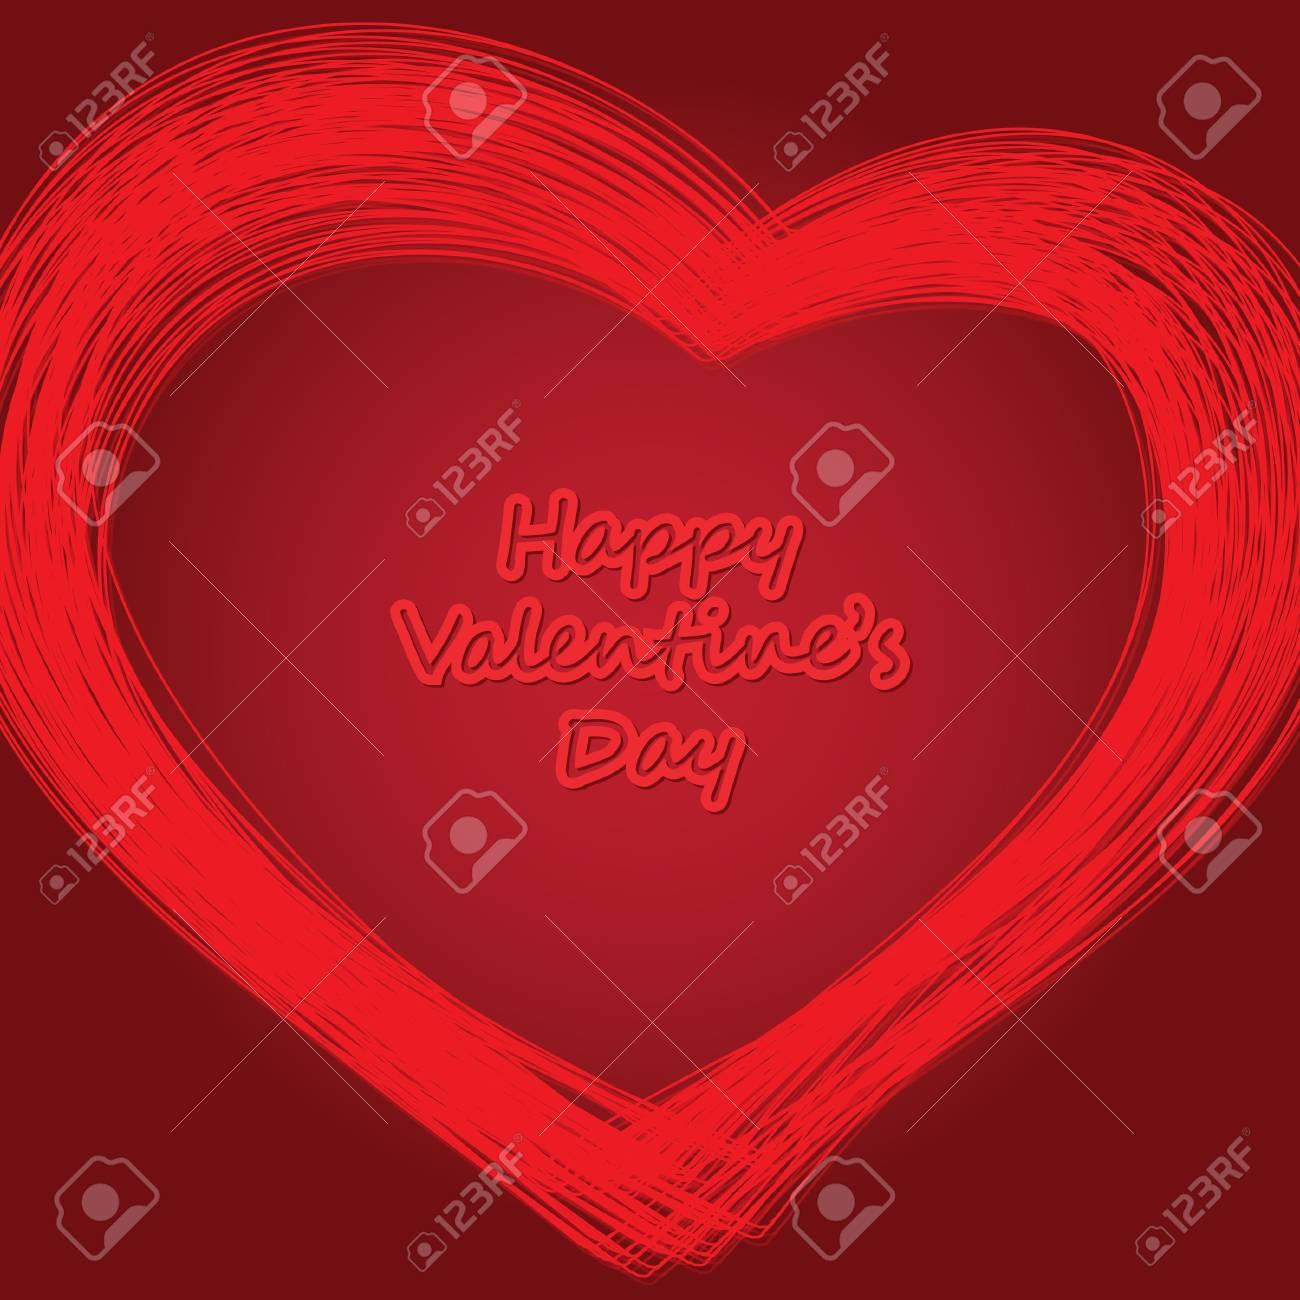 Hearts Background Vector Stock Vector - 10551601